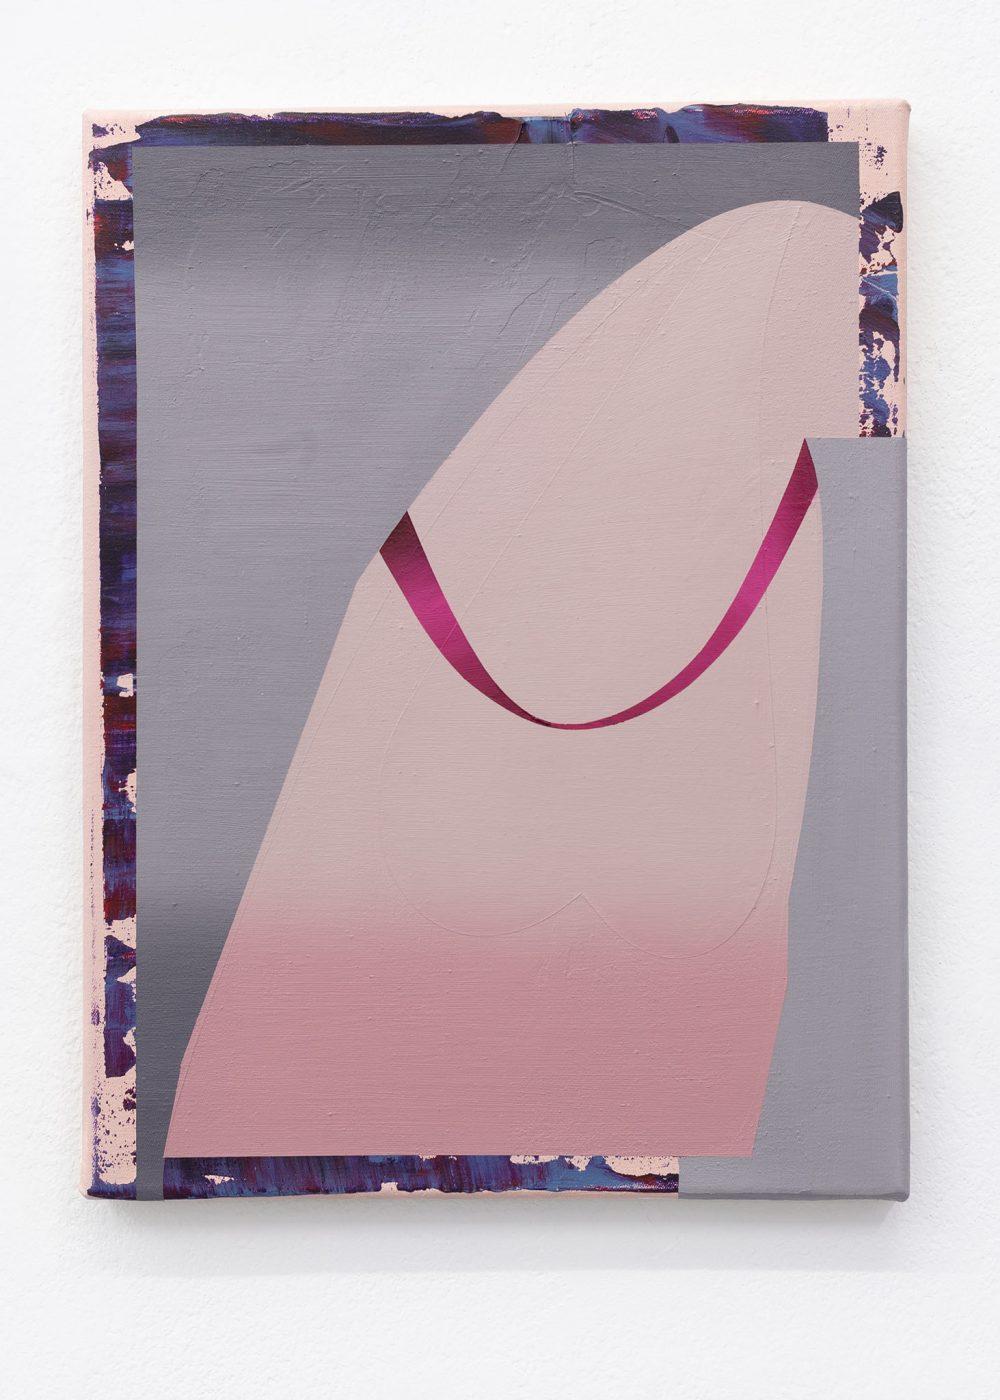 Anna Nero - Paintings - Öl und Acryl auf Leinwand - Galerie Falko Alexander